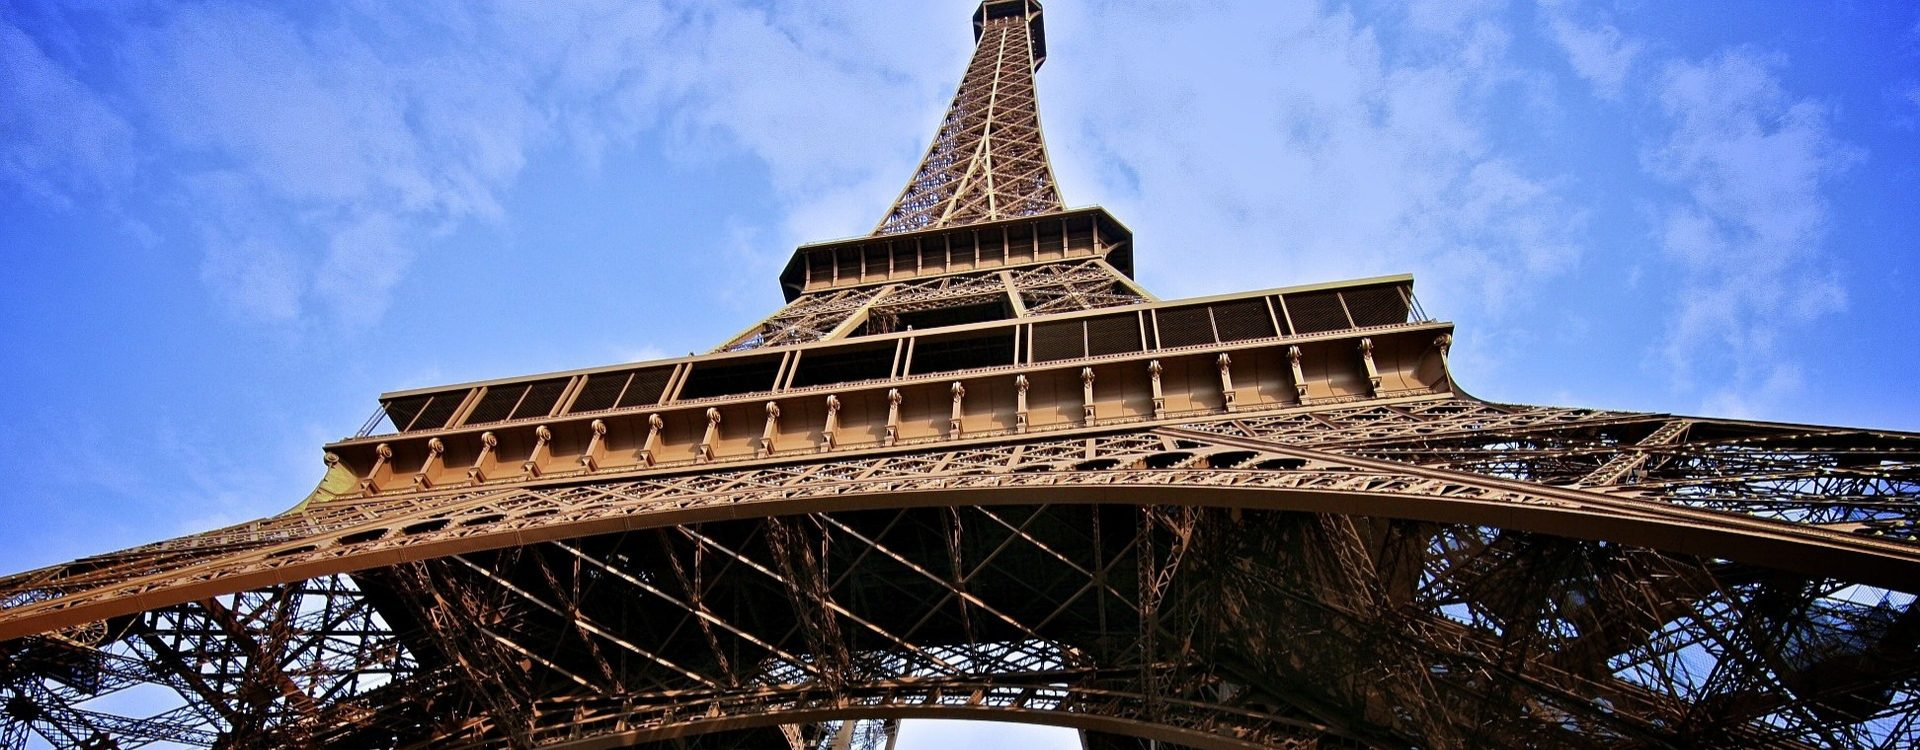 France - Les Matins du Monde